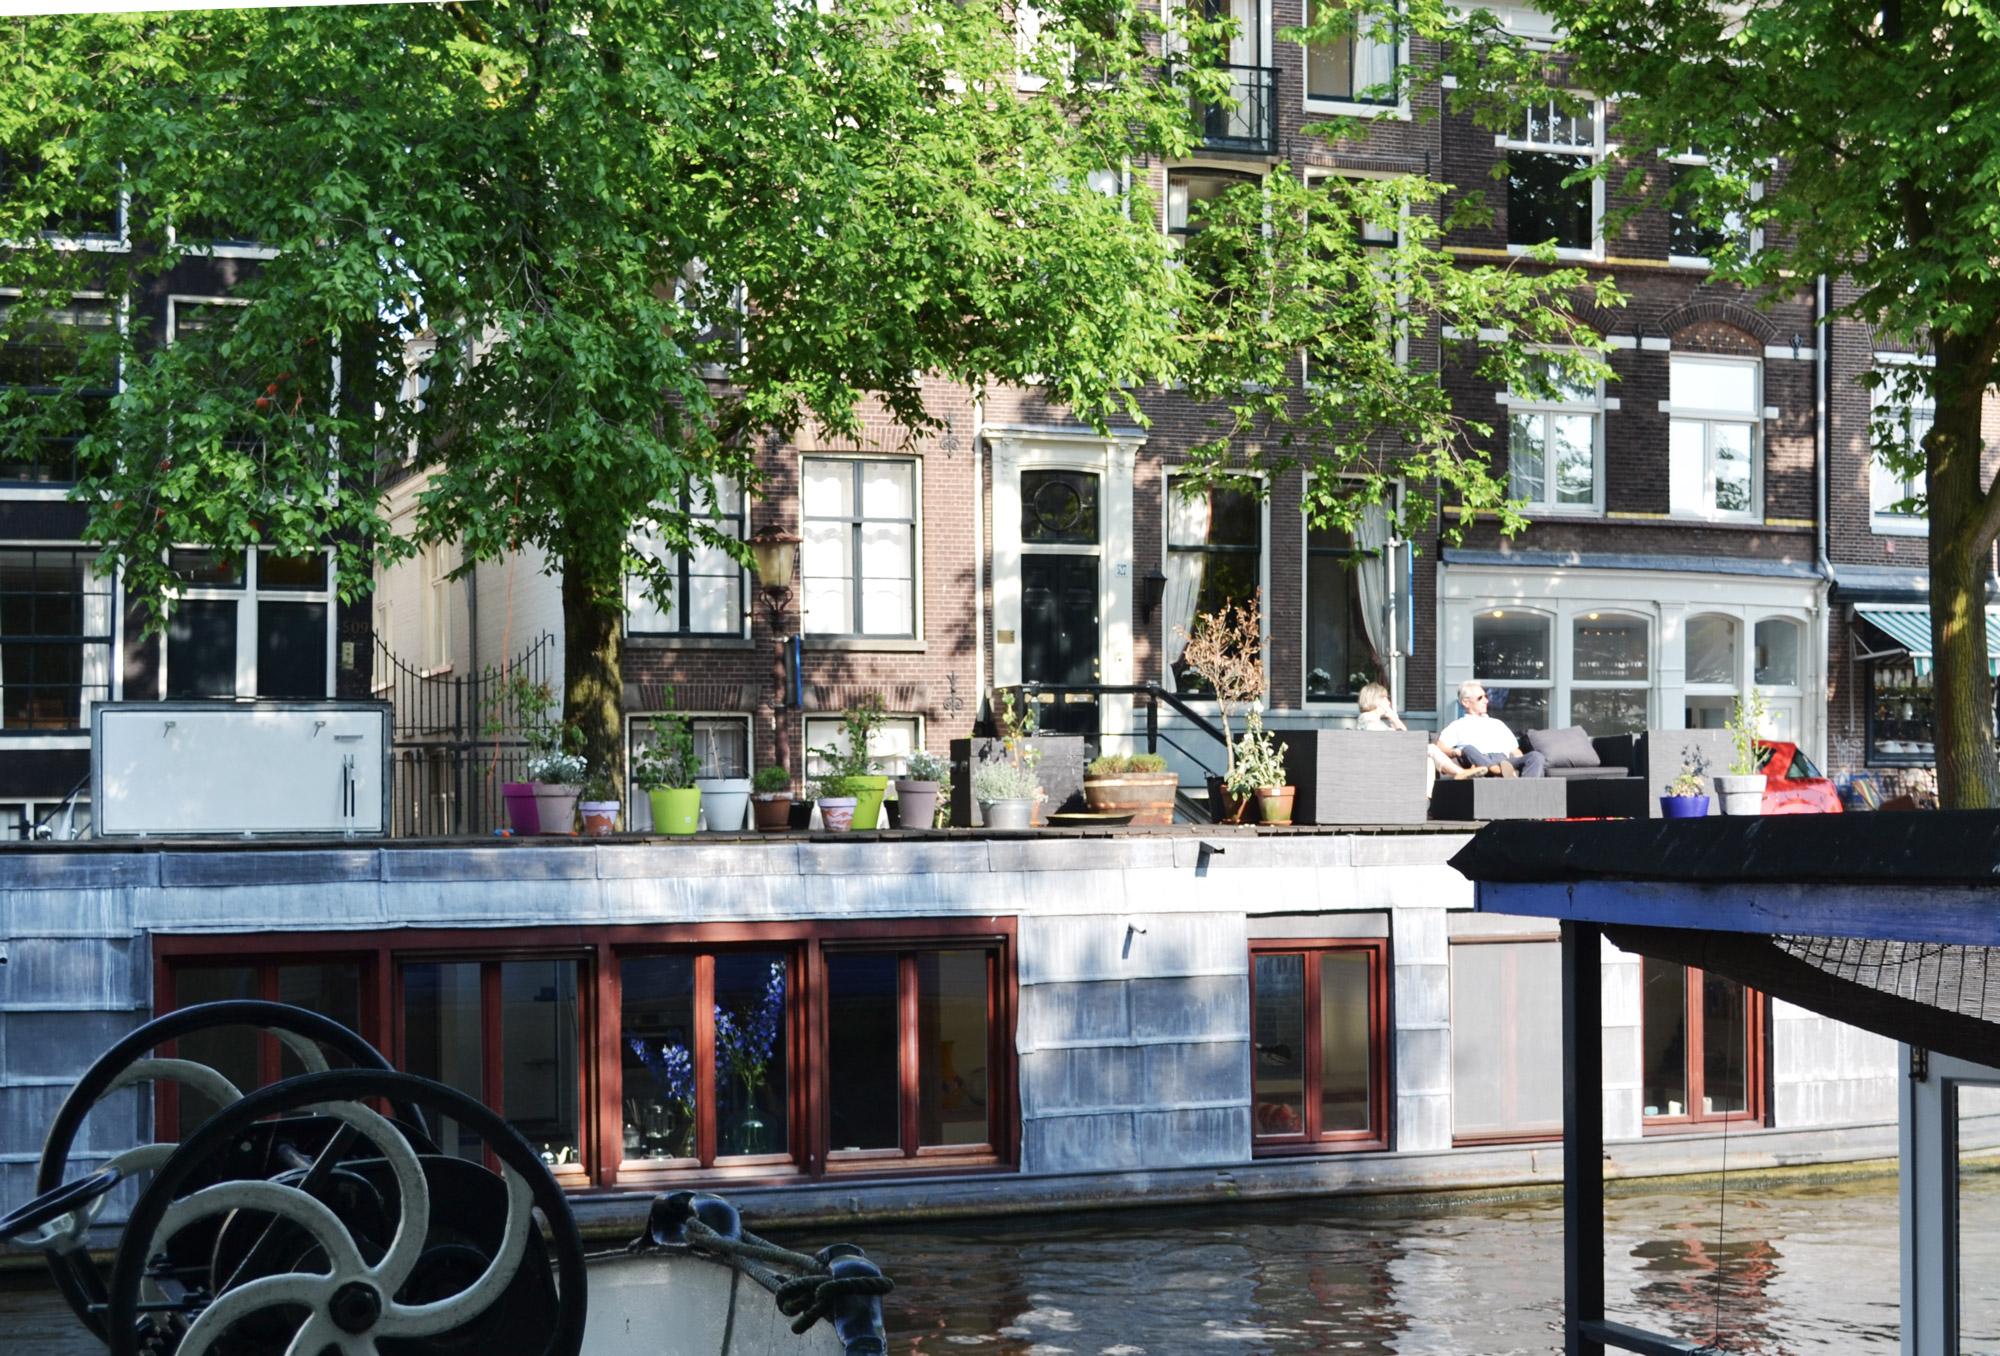 urbanbacklog-amsterdam-canal-houses-7.jpg